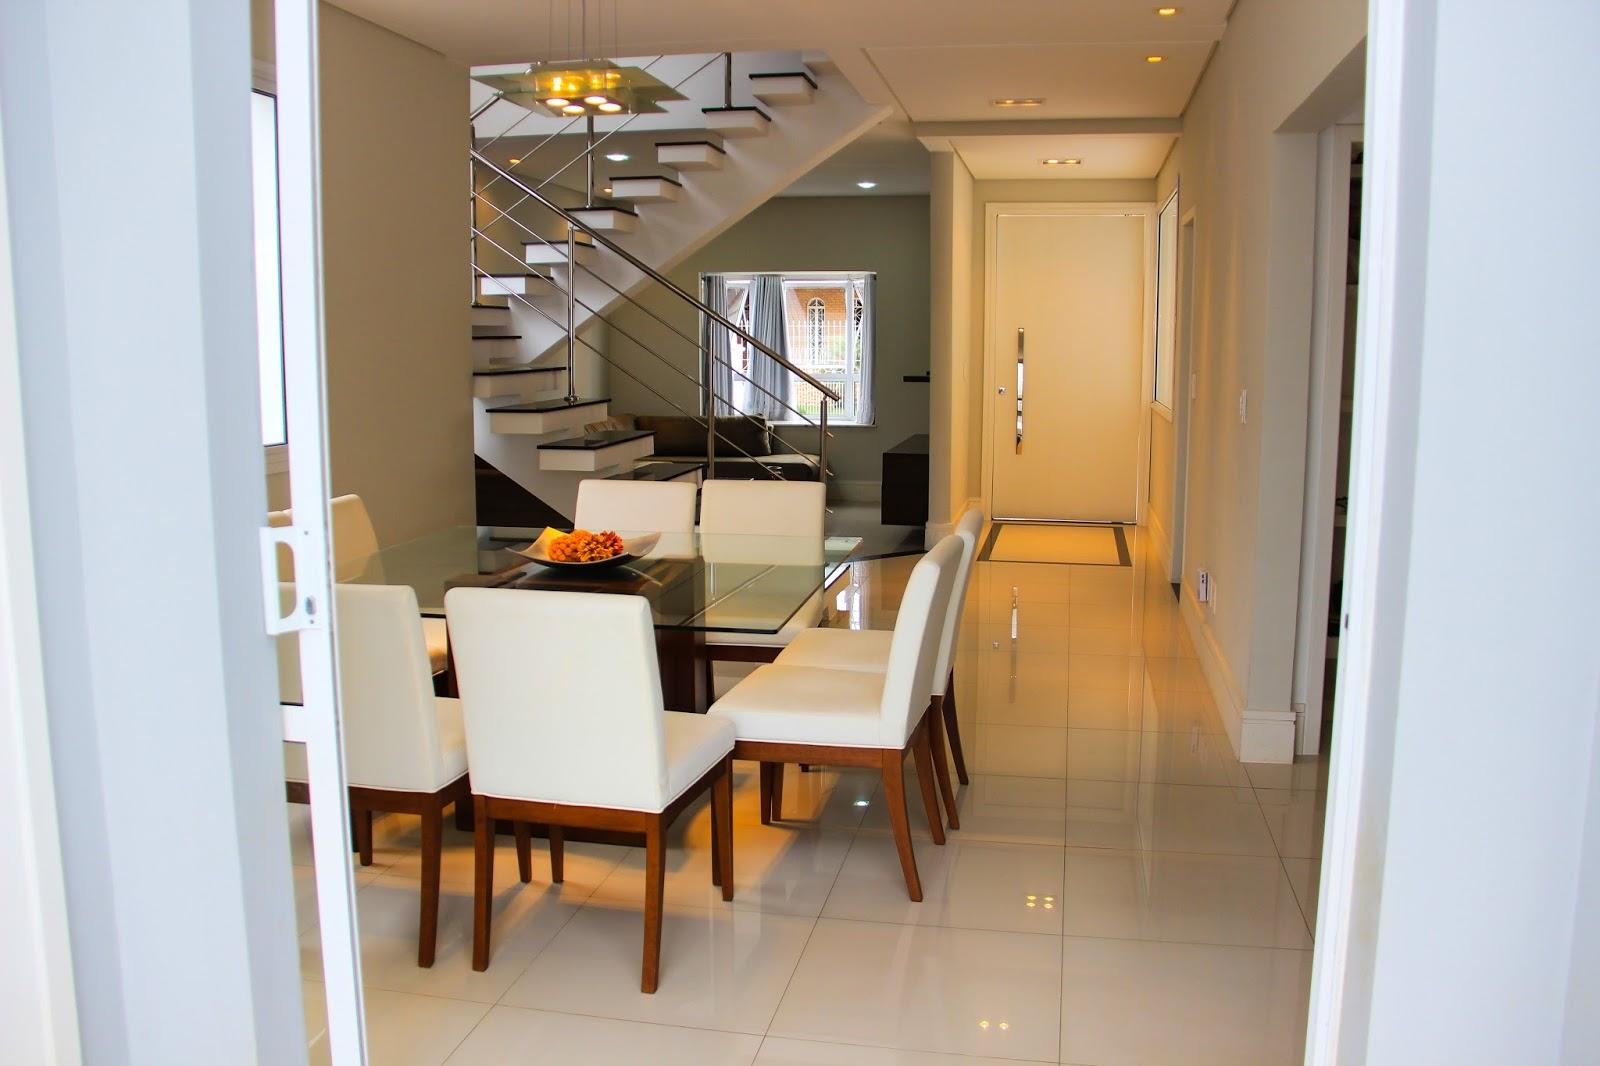 Fotos De Escadas Na Sala De Jantar ~ Meyre Kajita Residência no Condomínio Primvera  Taubaté  SP